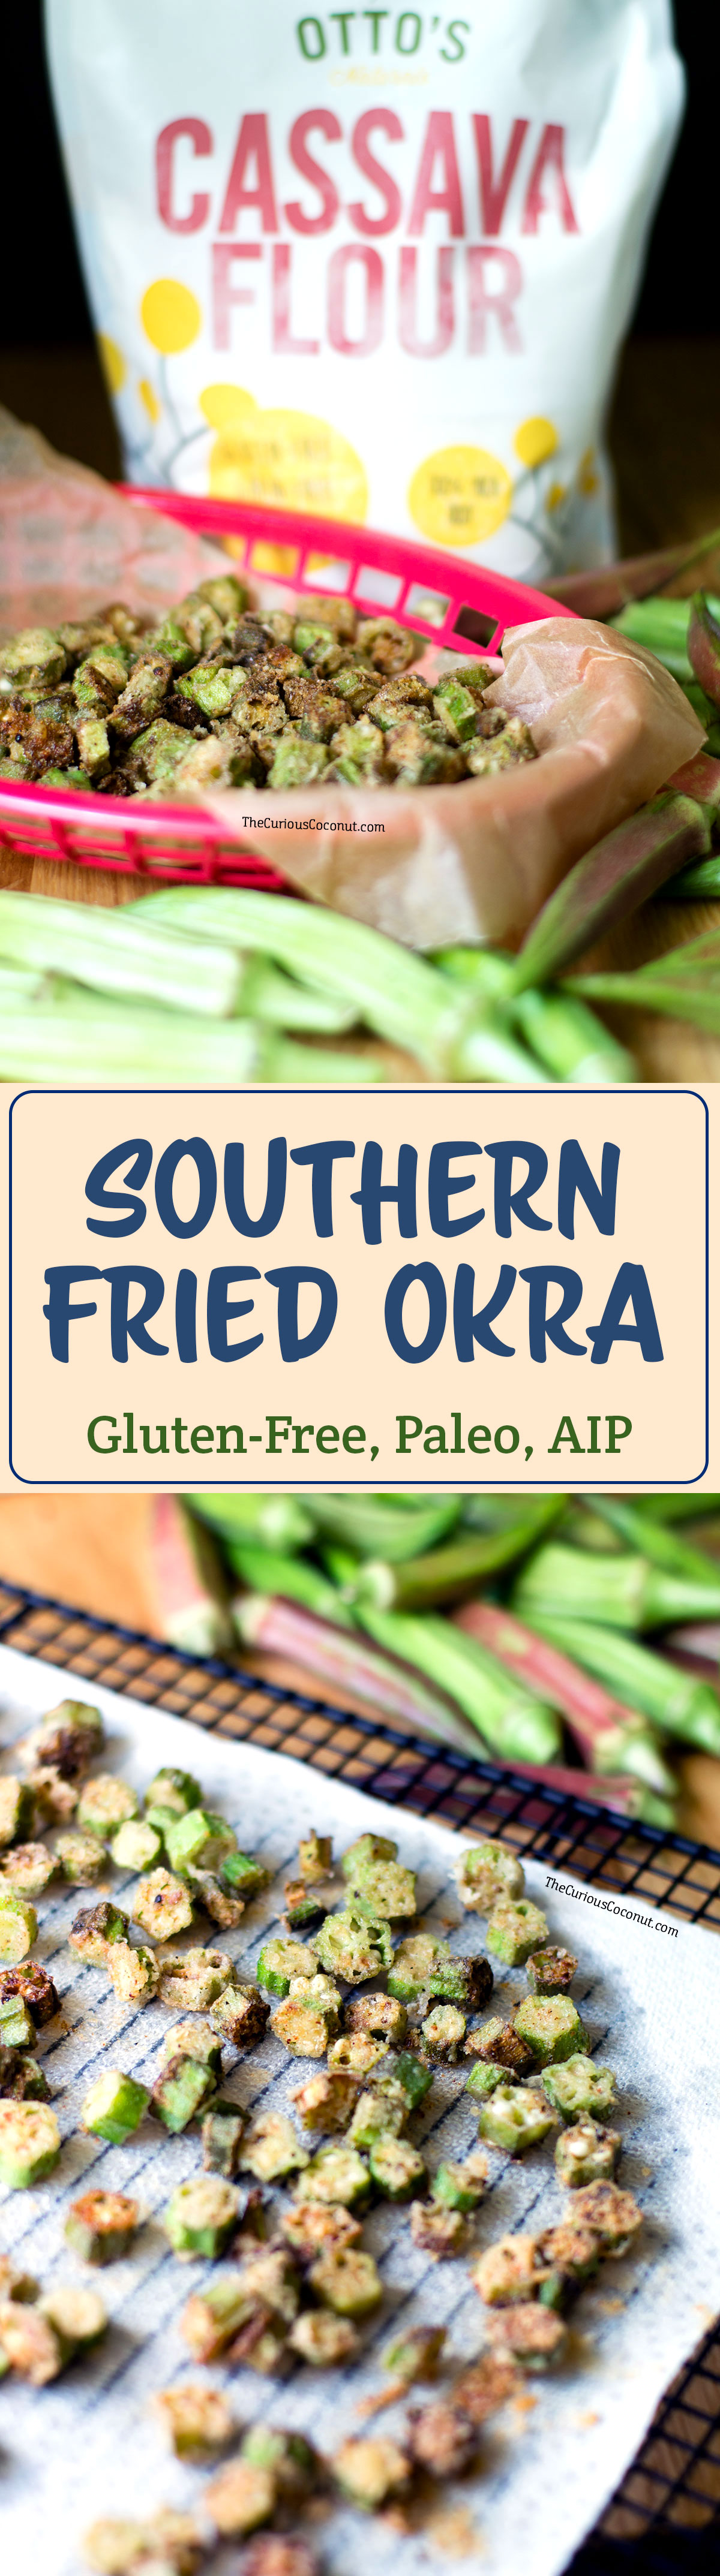 Southern Fried Okra // (Paleo, AIP, Gluten-free, Egg-free, Vegan)// TheCuriousCoconut.com